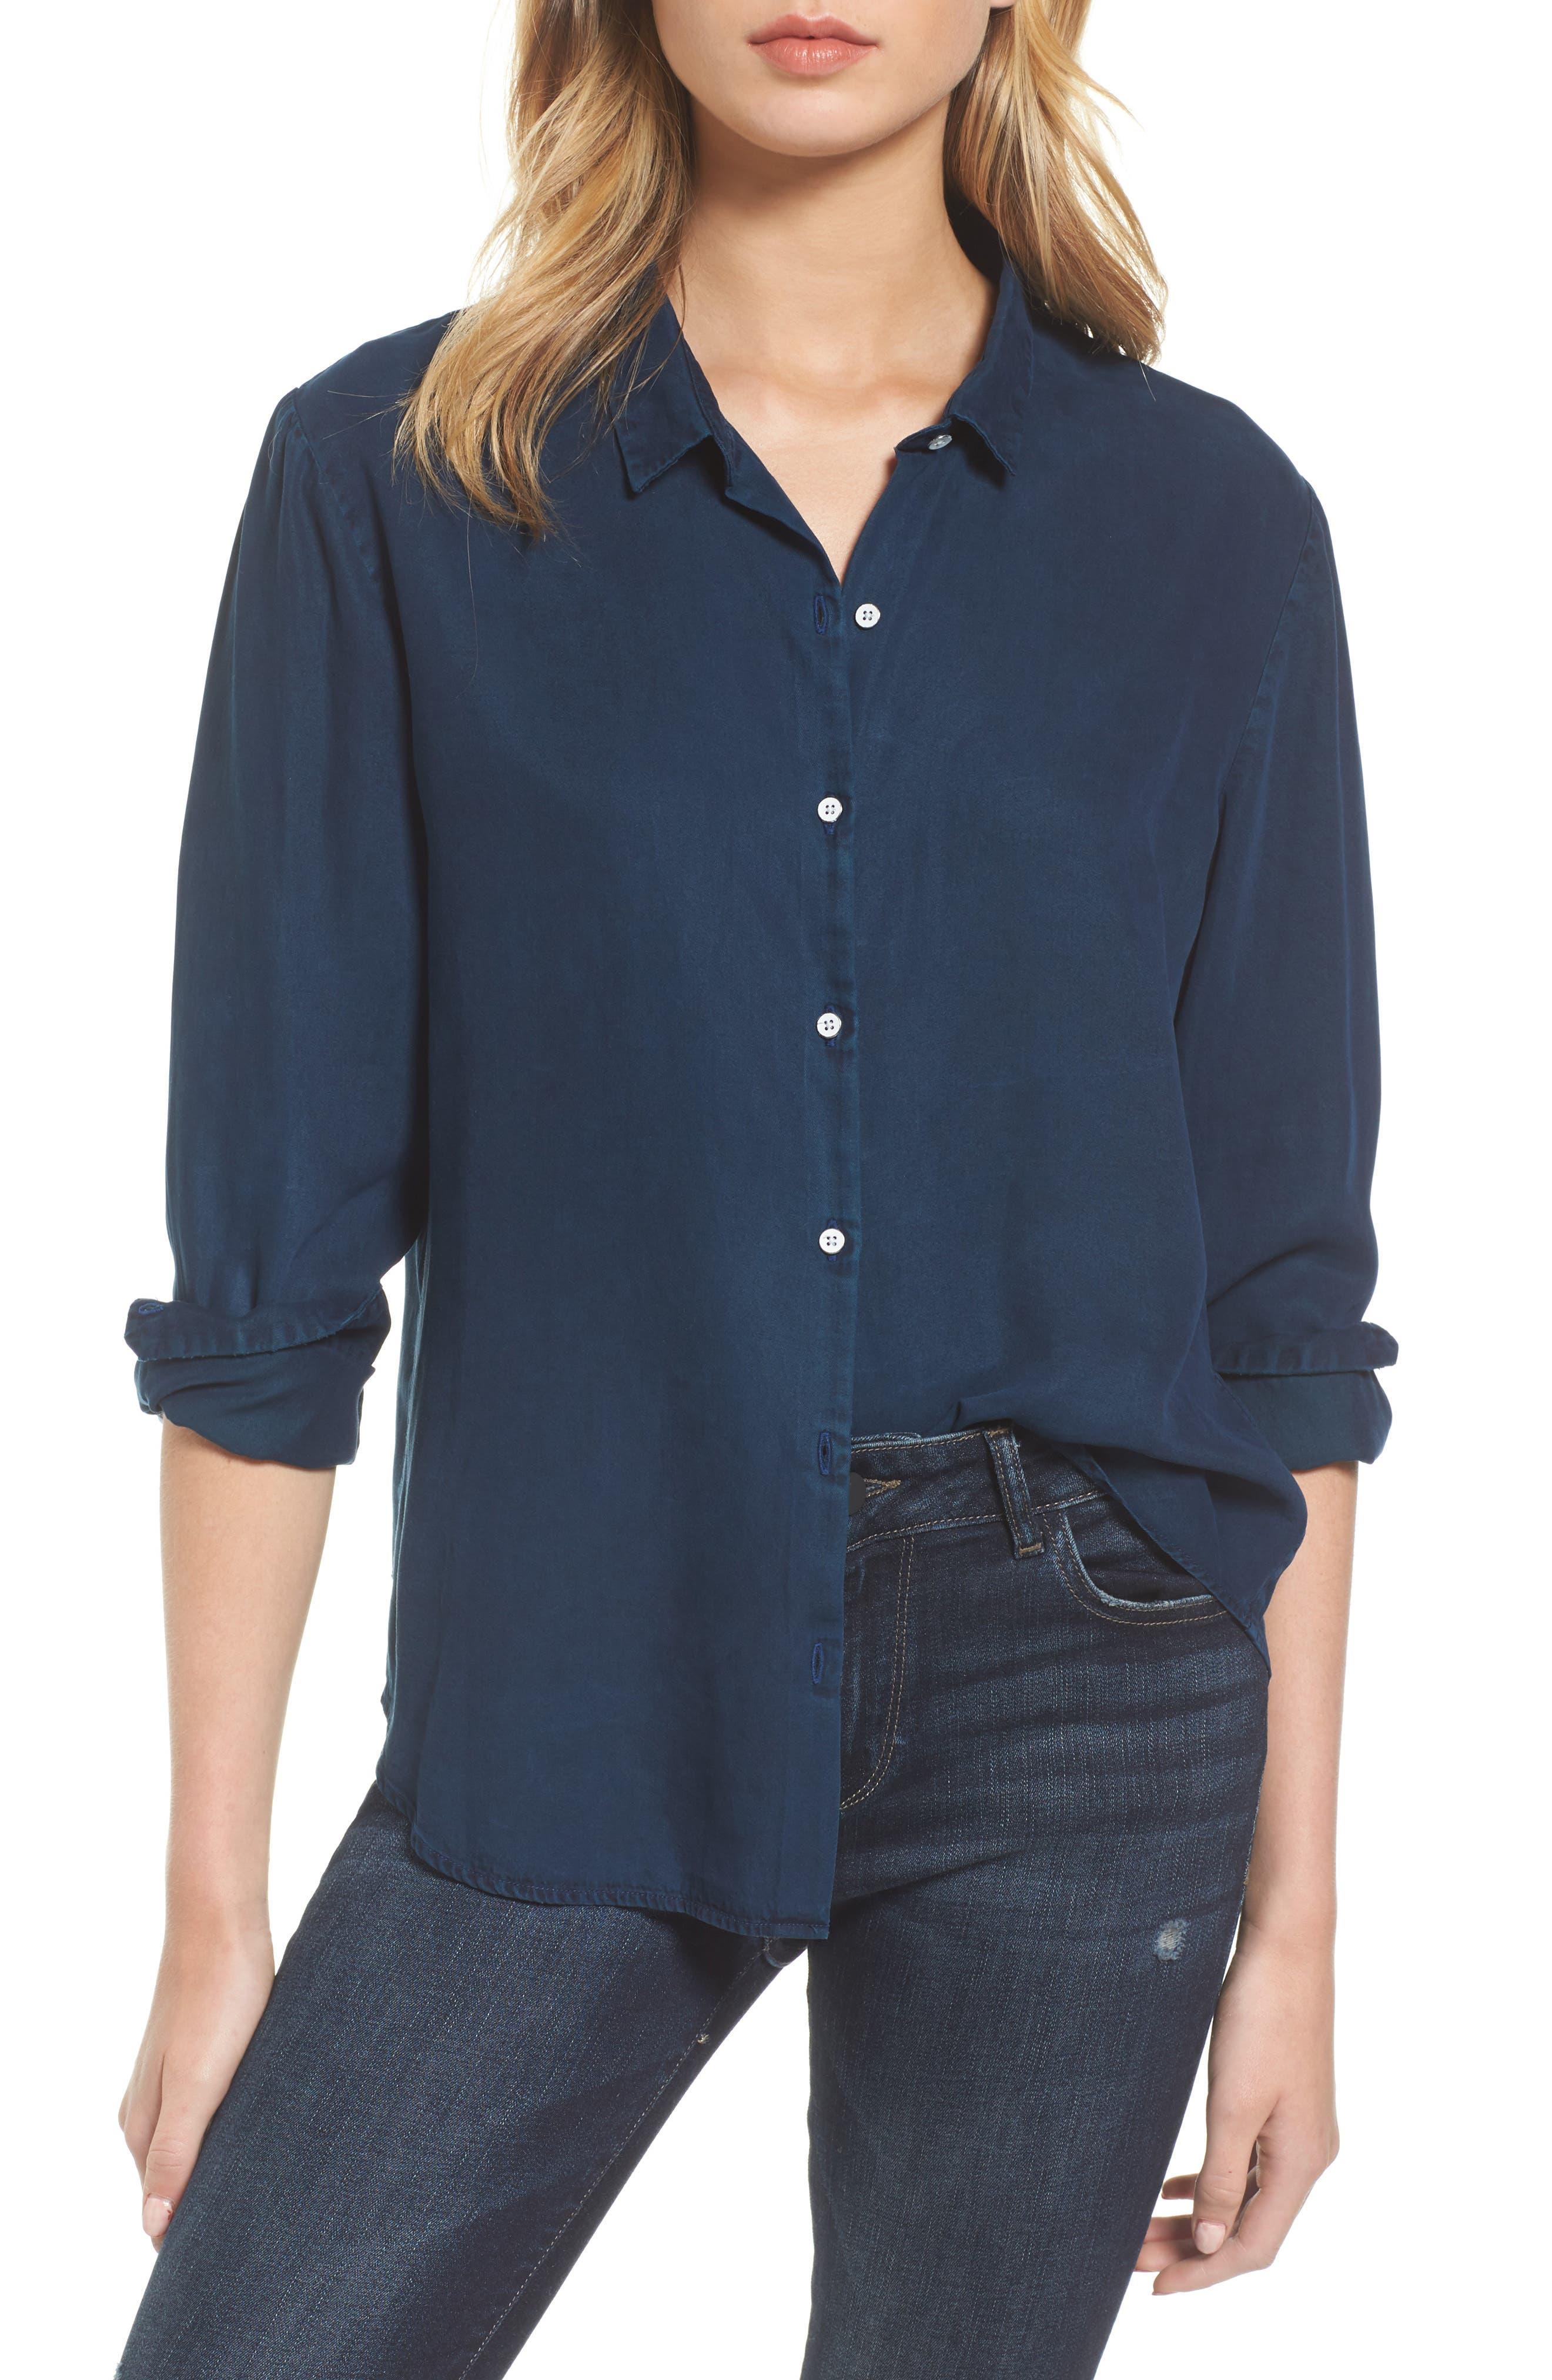 x The Blue Shirt Shop W 4th & Jane Slim Fit Shirt,                             Main thumbnail 1, color,                             405